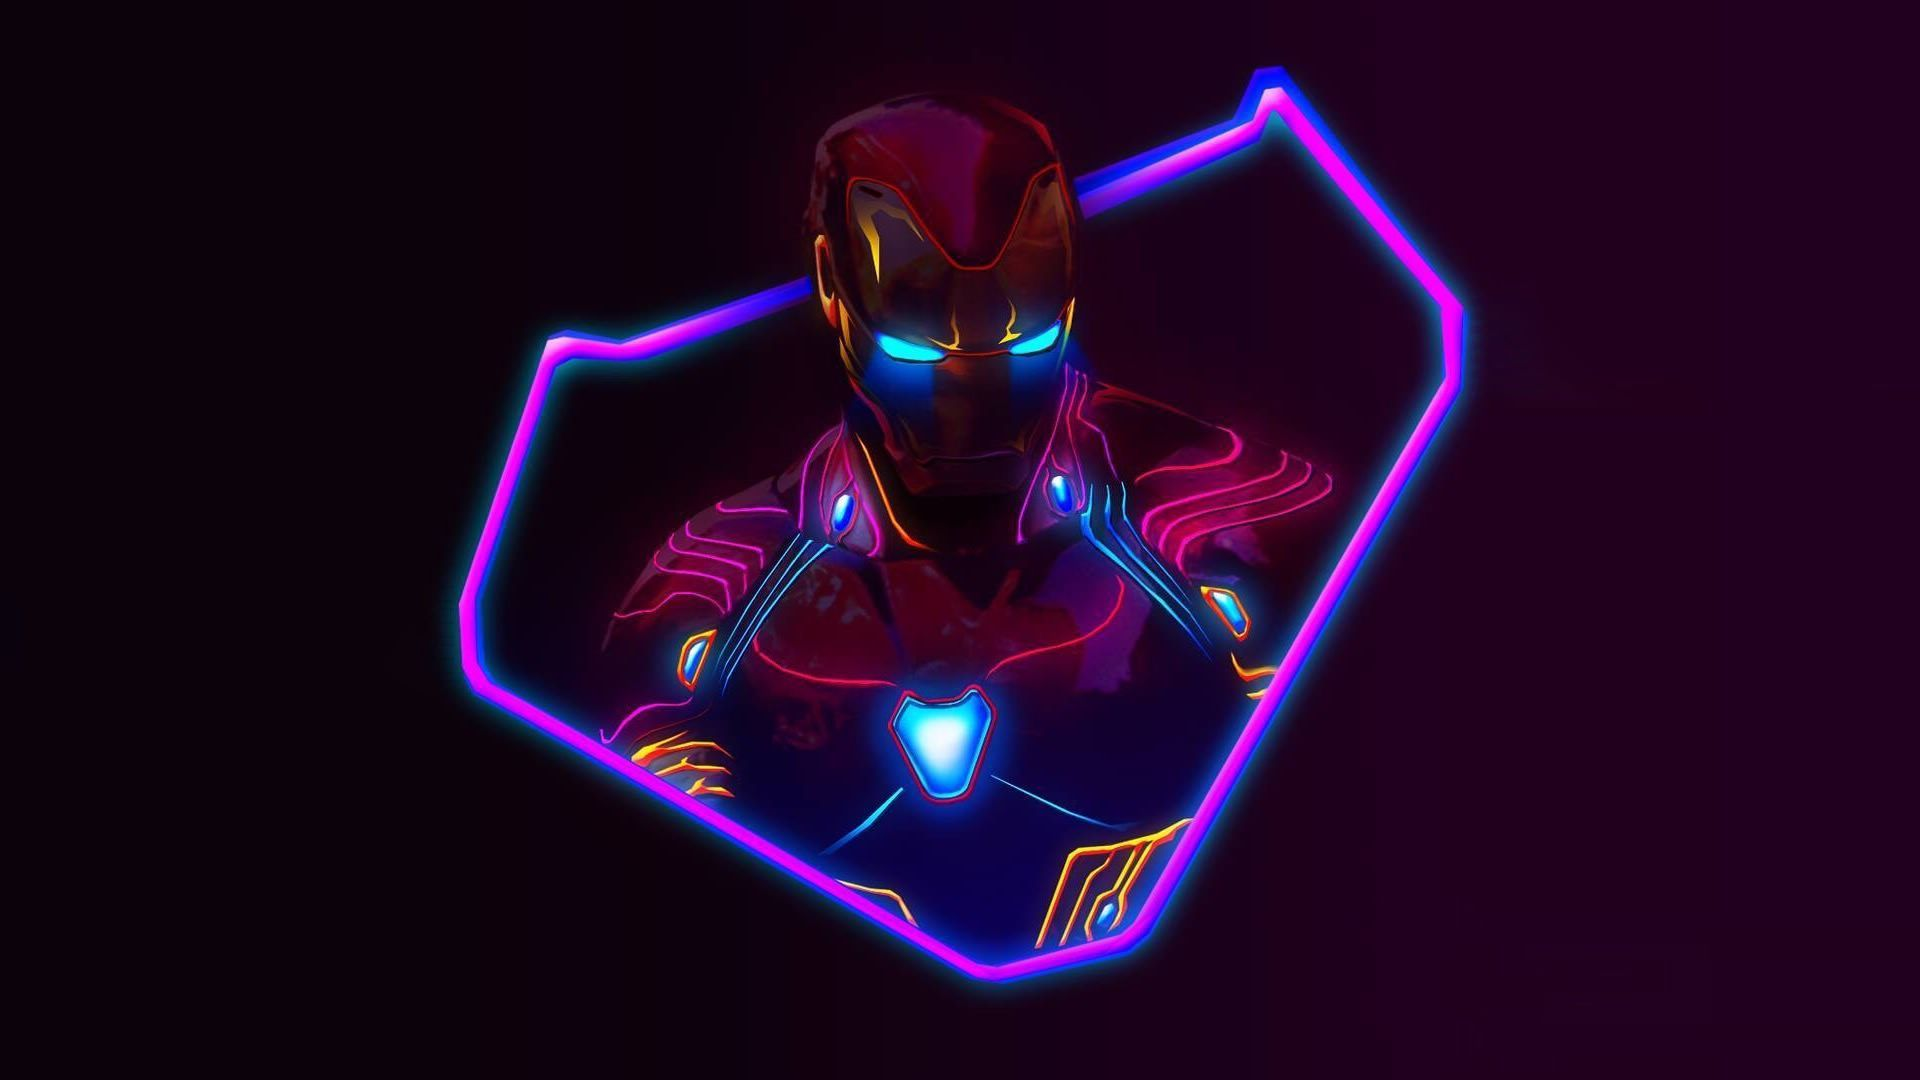 Iron Man Neon Wallpaper 4k